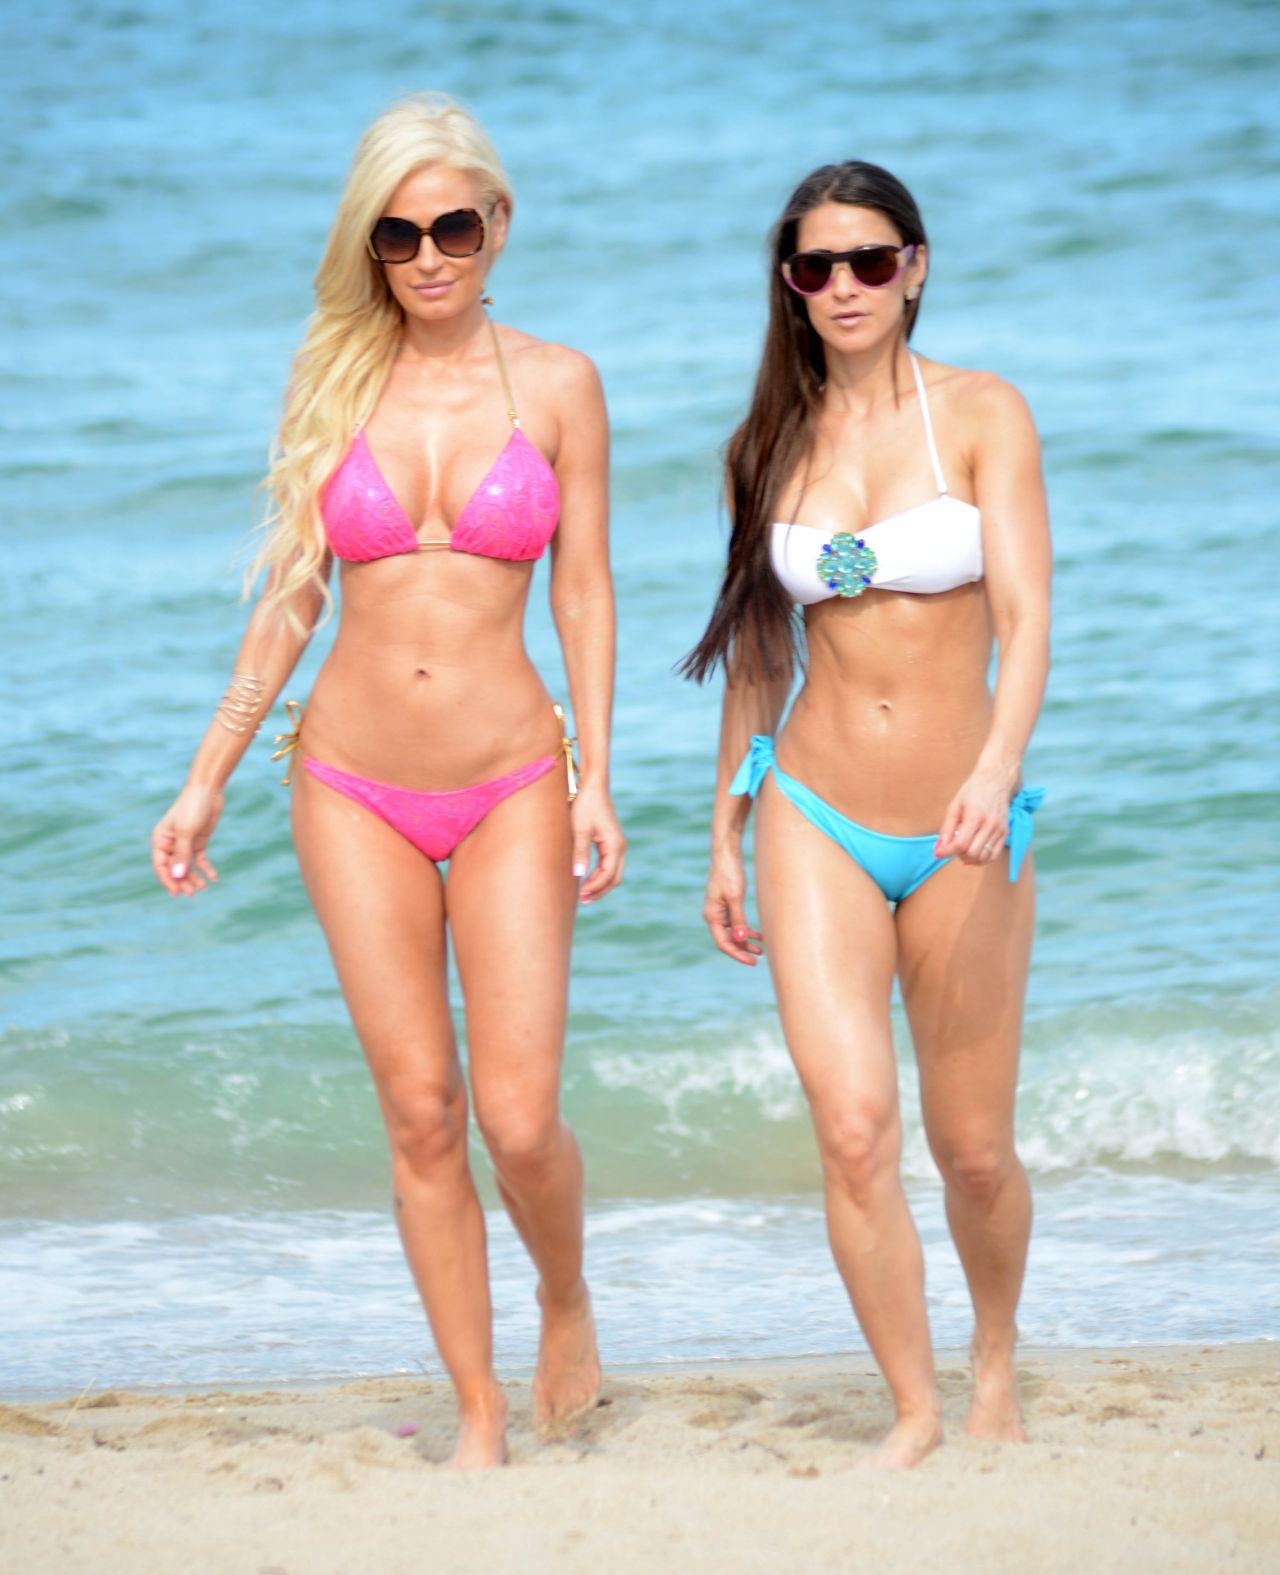 Anais Zanotti & Ana Braga in a Bikini - Beach in Miami - August 2014